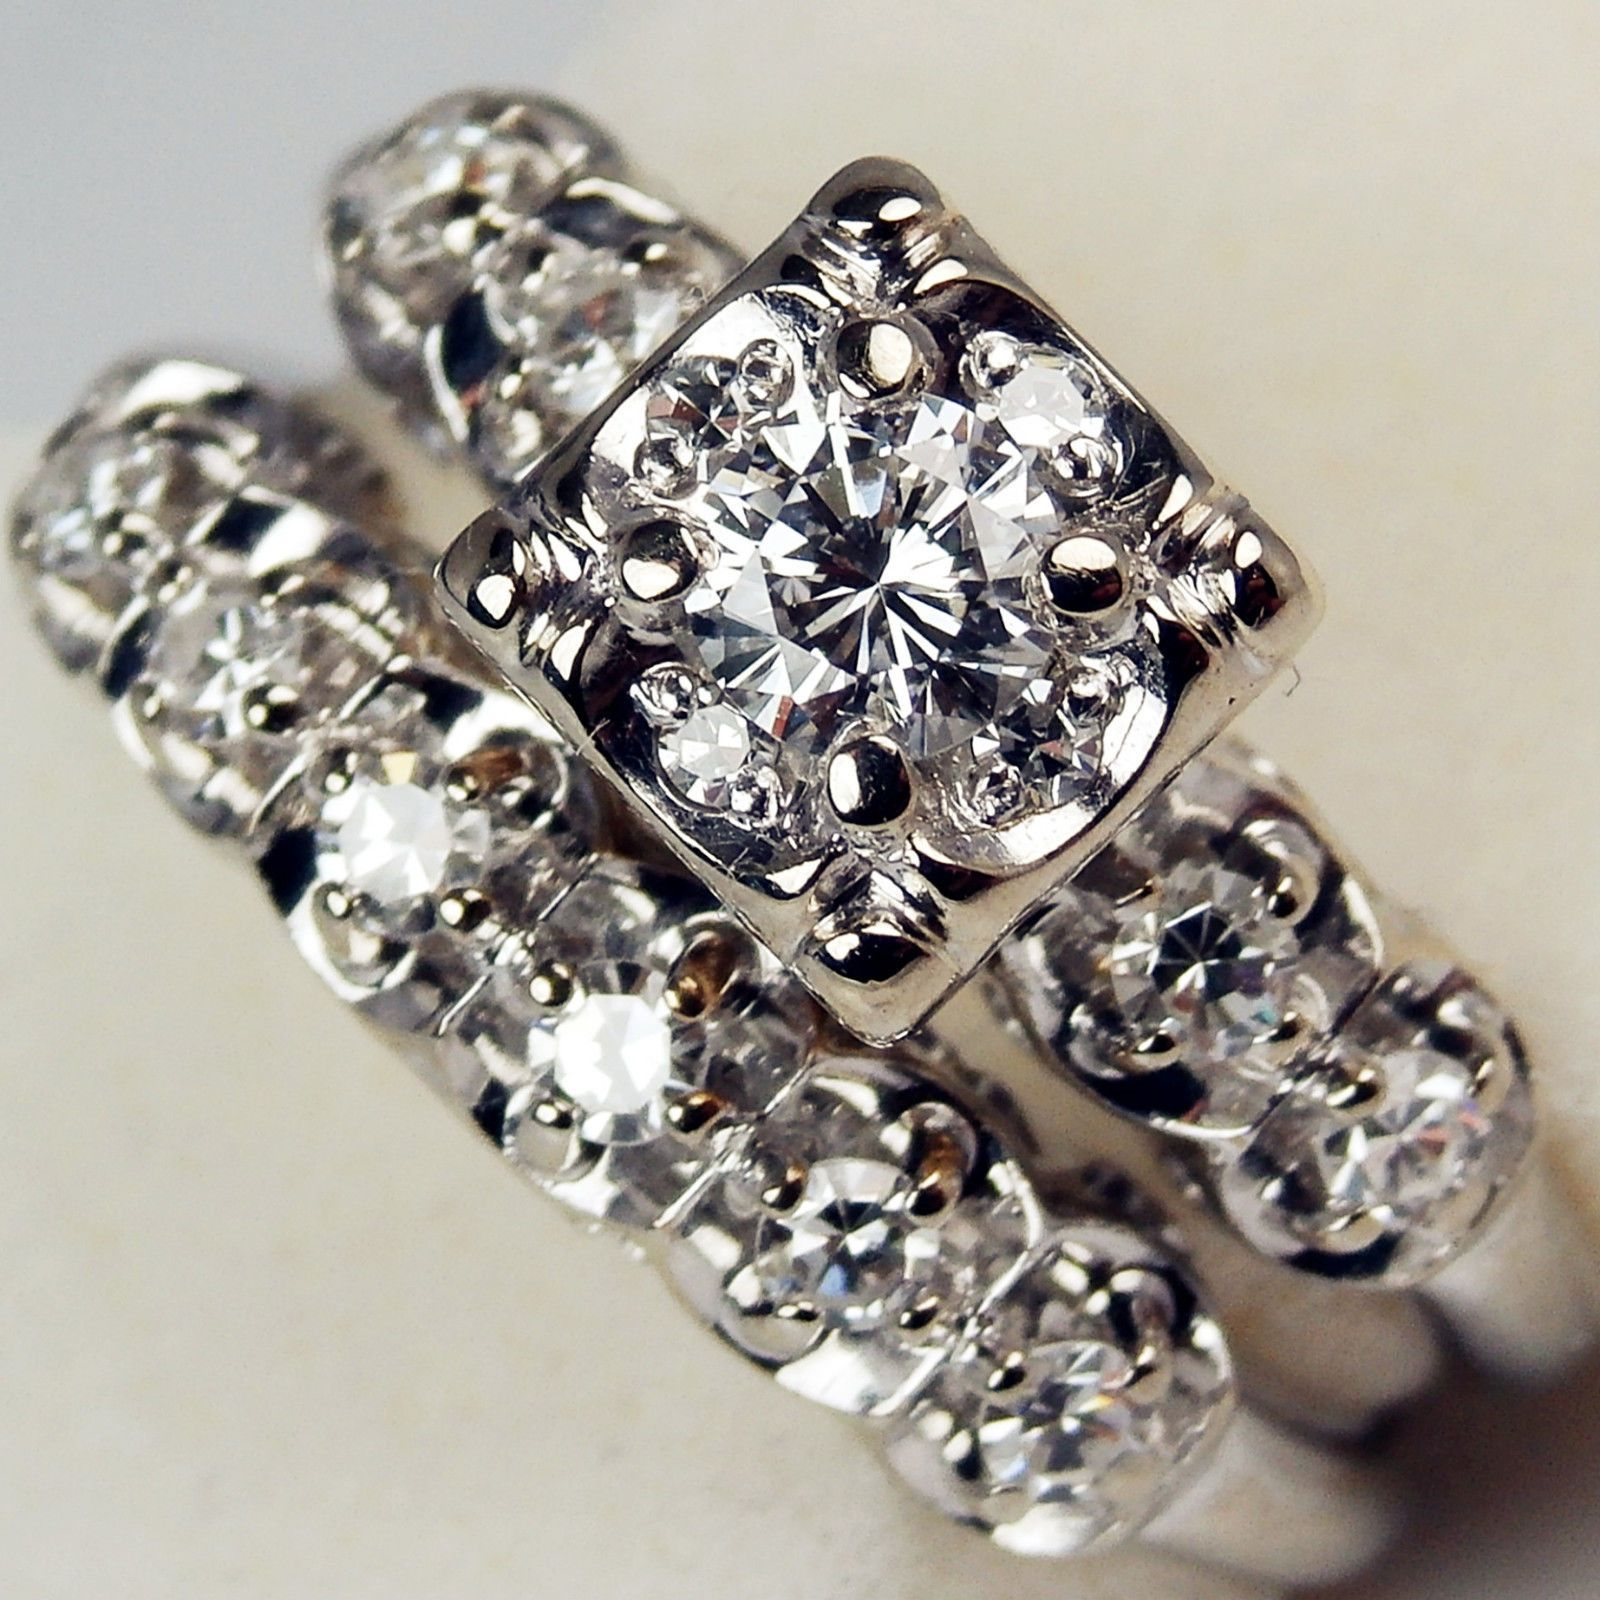 Keepsake 14k Gold Antique Illusion Diamond 35 Ct Engagement Ring